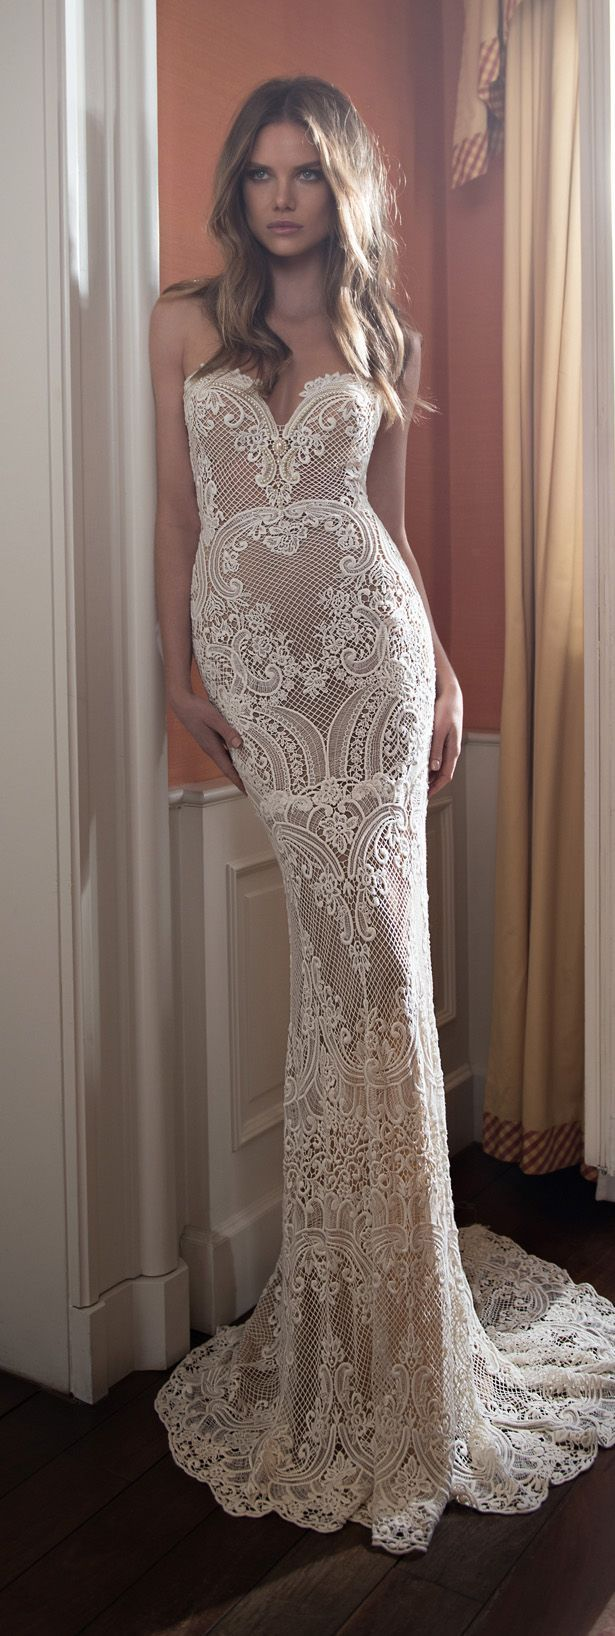 best noiva images on pinterest bridal dresses gown wedding